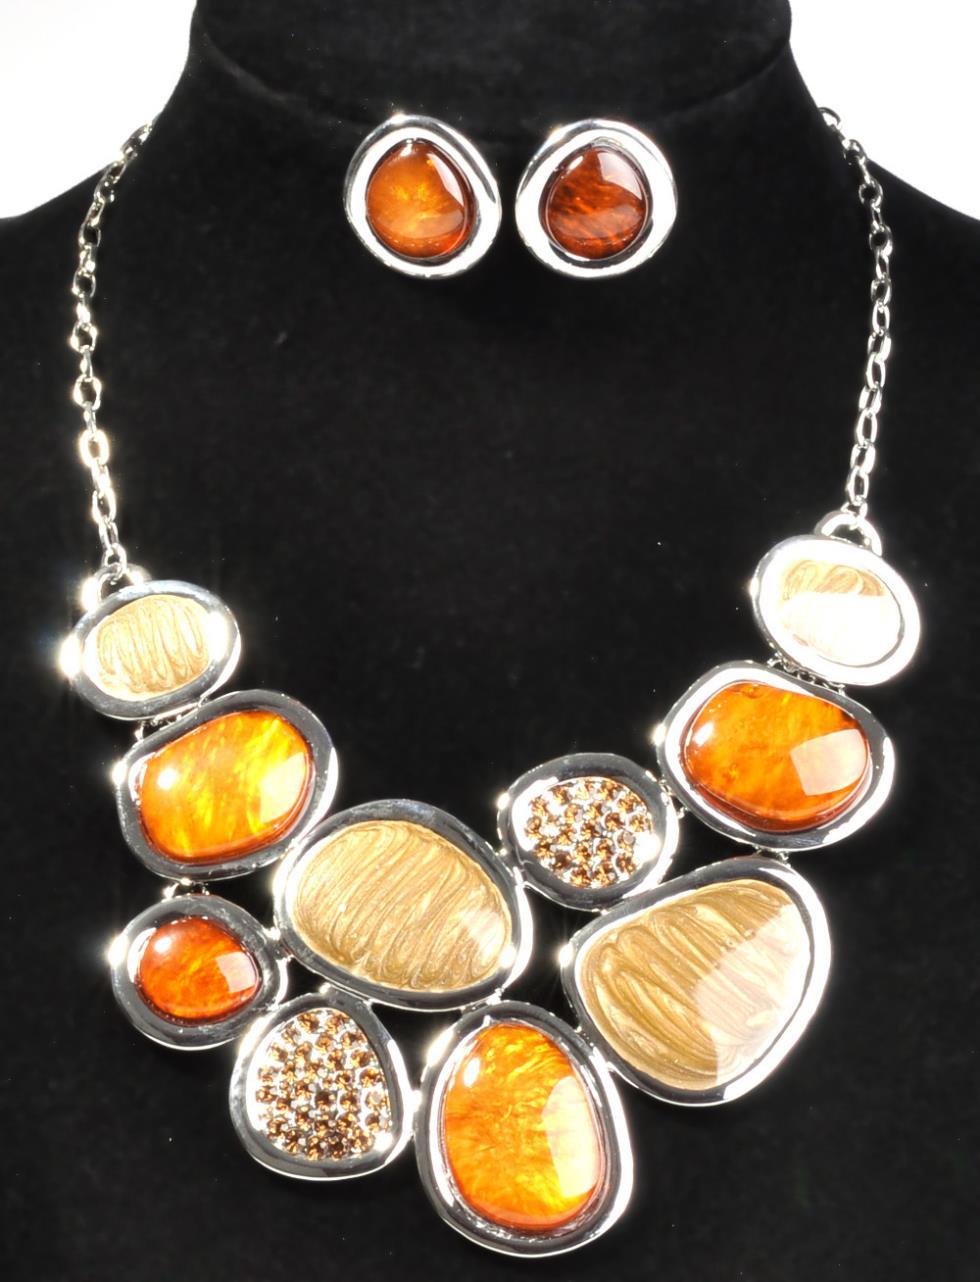 2014 New Fashion Jewelry Sets gunmatel plated Unique Design Party Gifts High Quality fashion jewelry sets,amber SWIRL ENAMEL(China (Mainland))